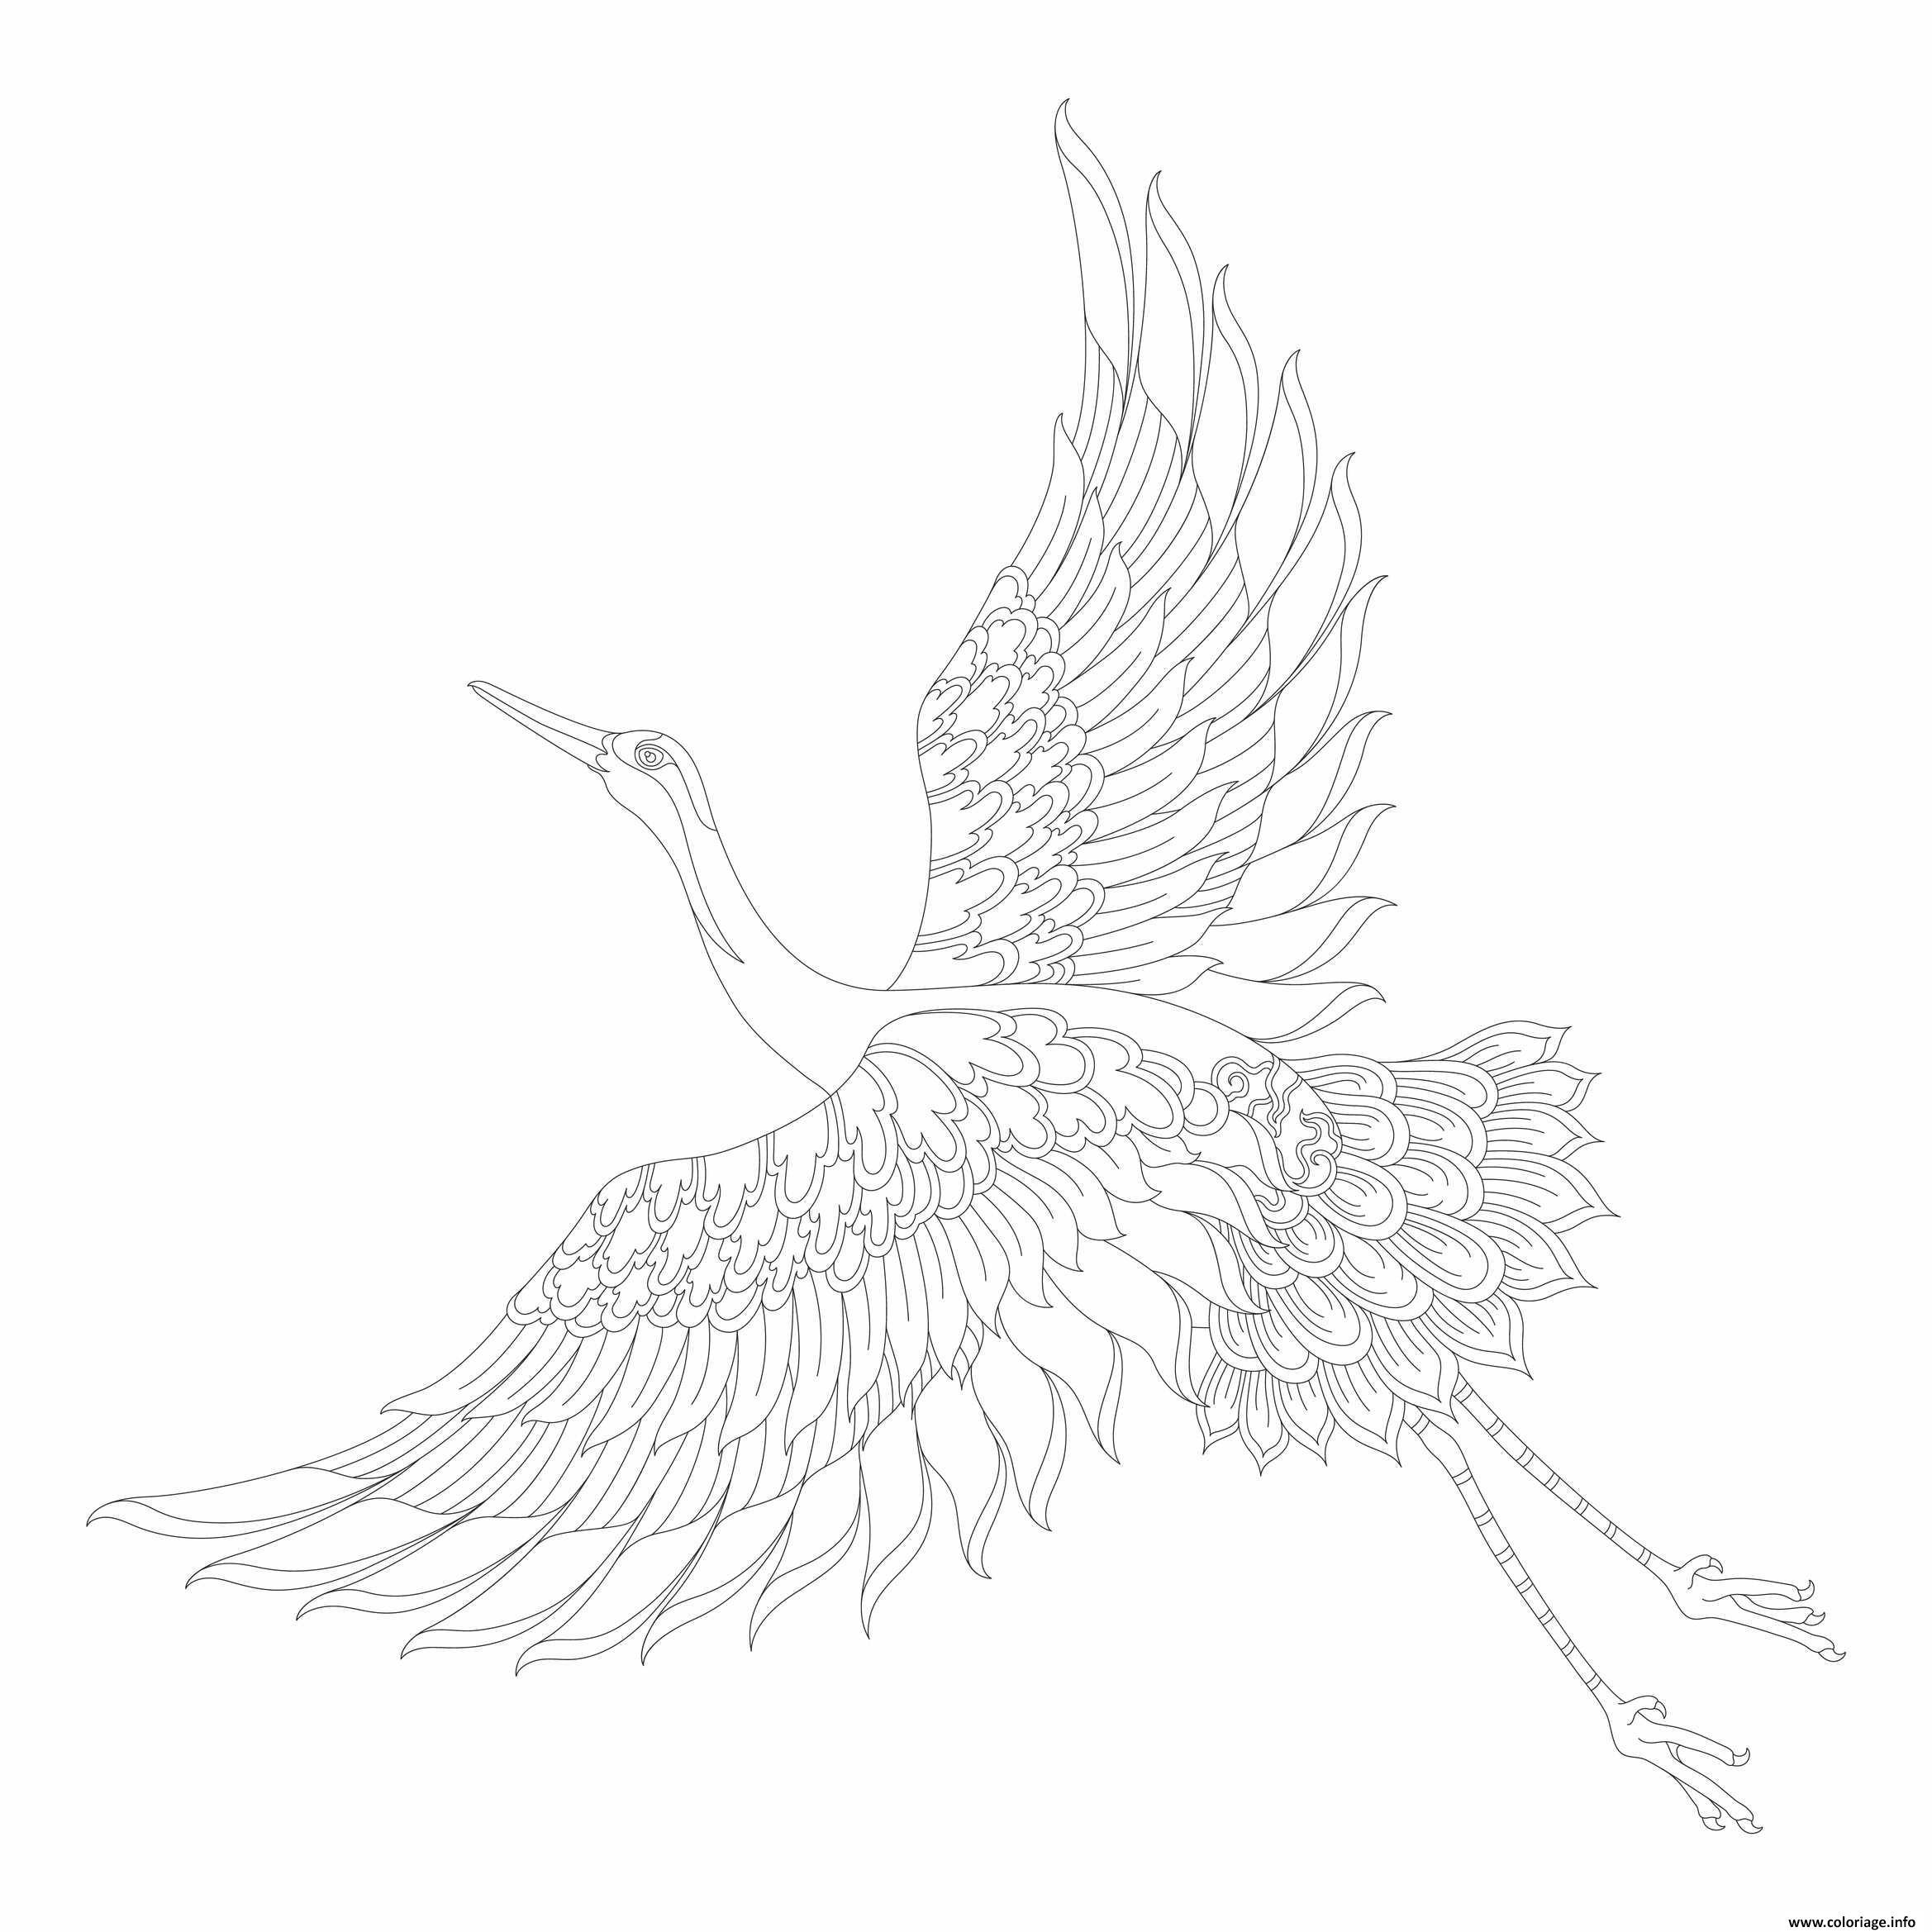 Coloriage Oiseau Gruides Animaux Adulte Jecolorie Com